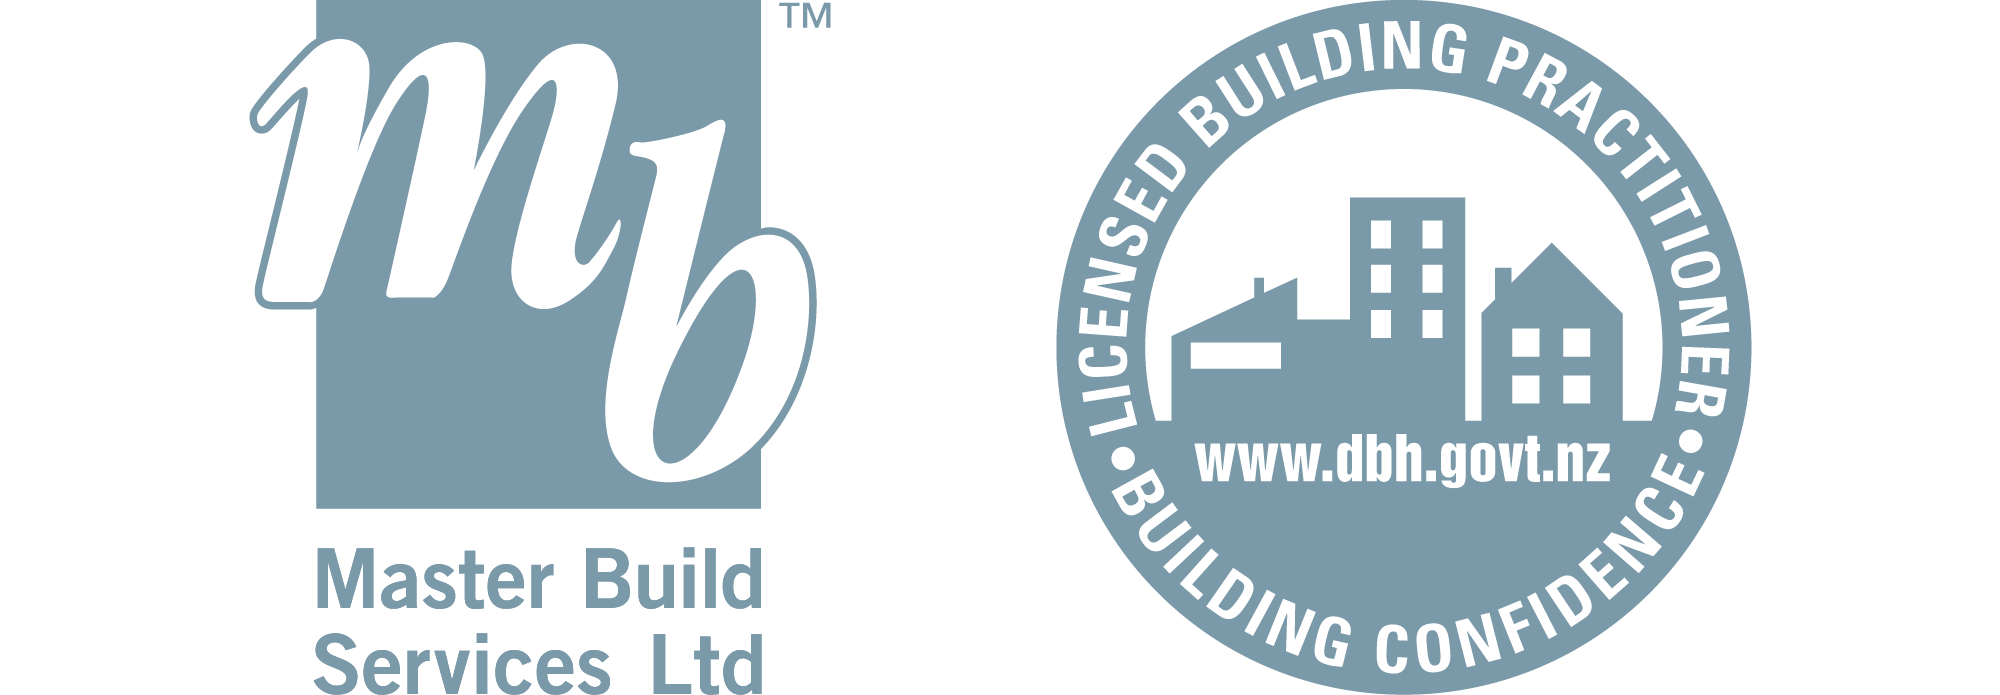 Master-Builder-LBP-Tim-Whittle-Homes-Builders-Morrinsville-Matamata-Waihi-Te-Aroha-Waikato.png